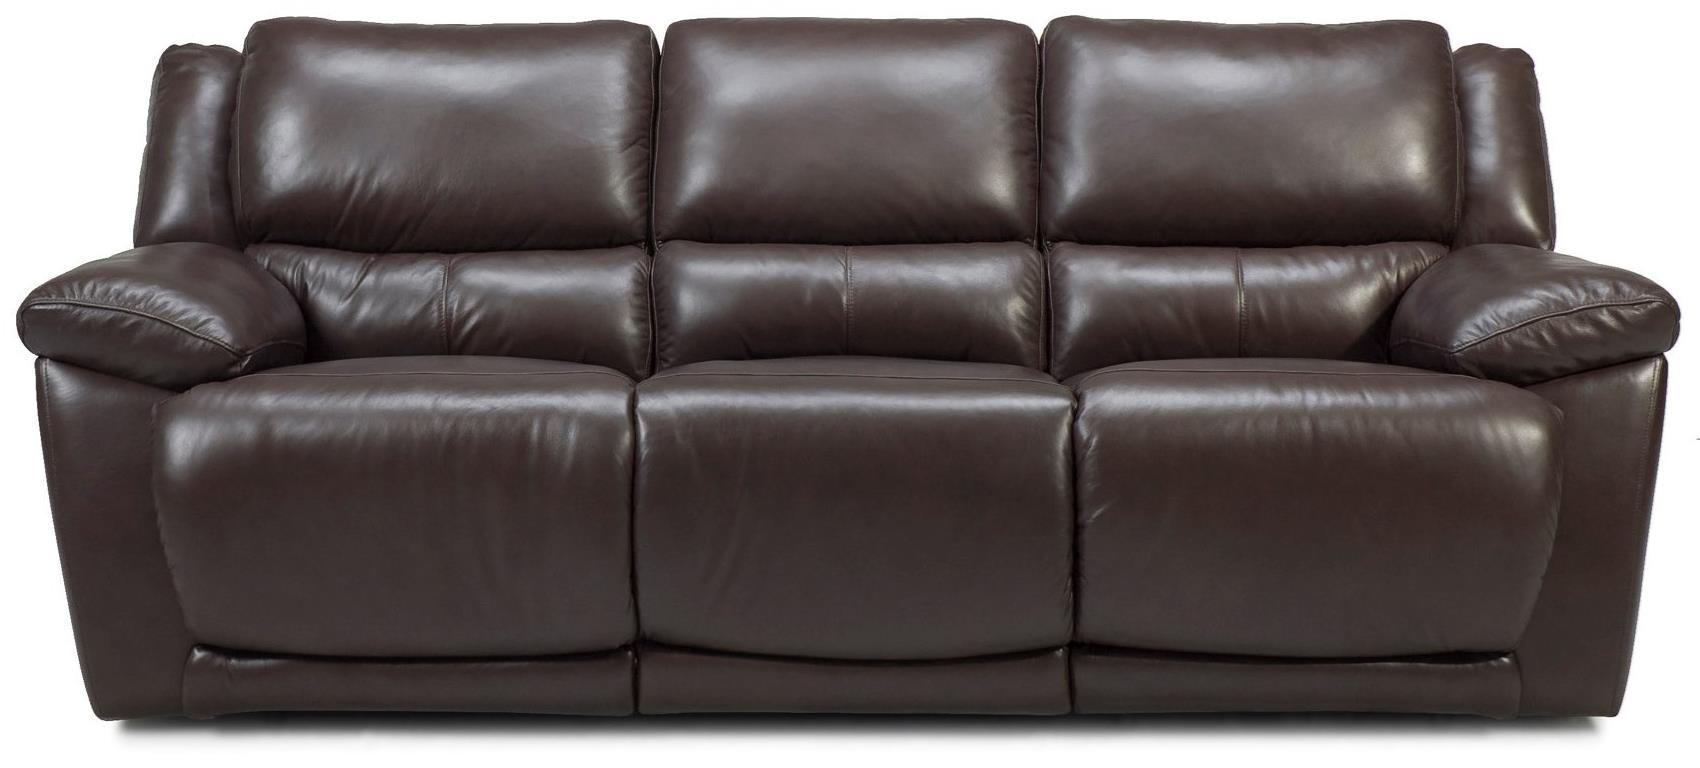 Futura Leather M149 Reclining Sofa - Item Number: M149 Sofa